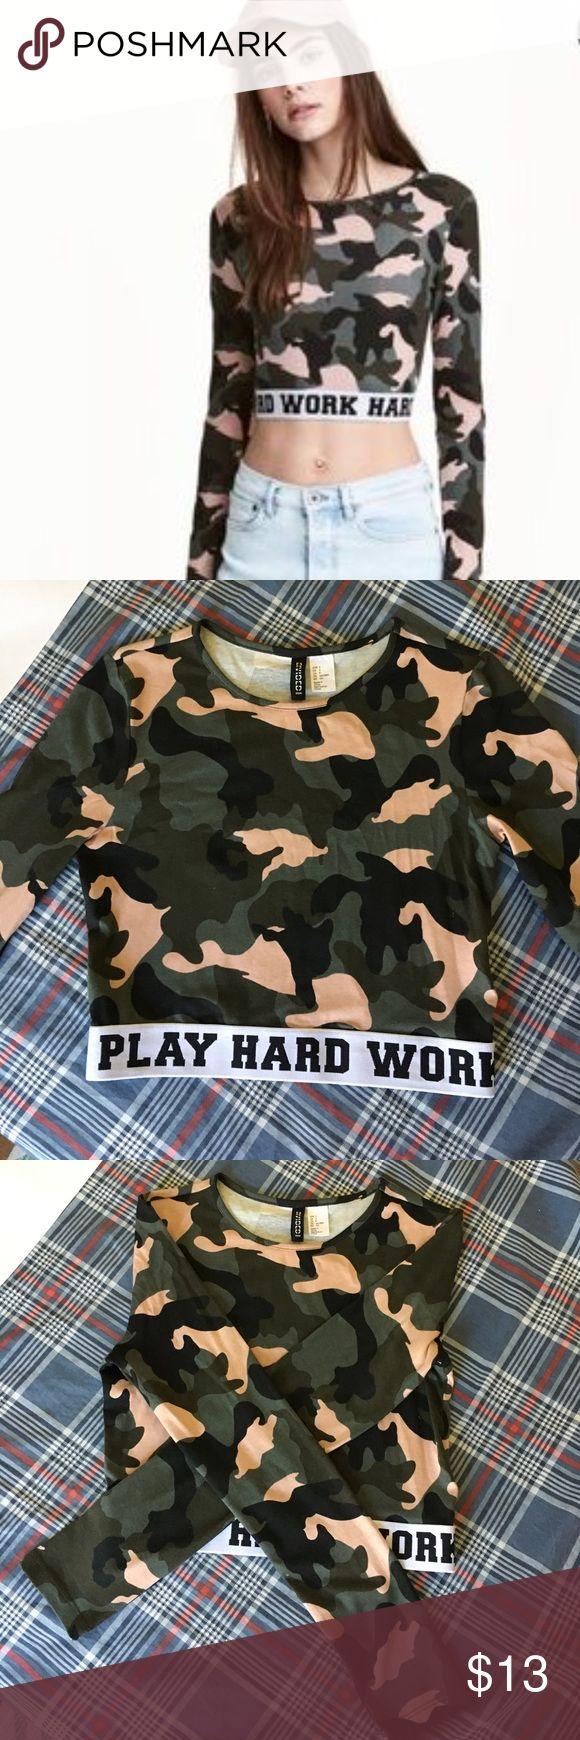 Play Hard Work Hard Camo Crop Top NWOT. H&M Camo crop top. Long sleeve. Size Small. H&M Tops Crop Tops